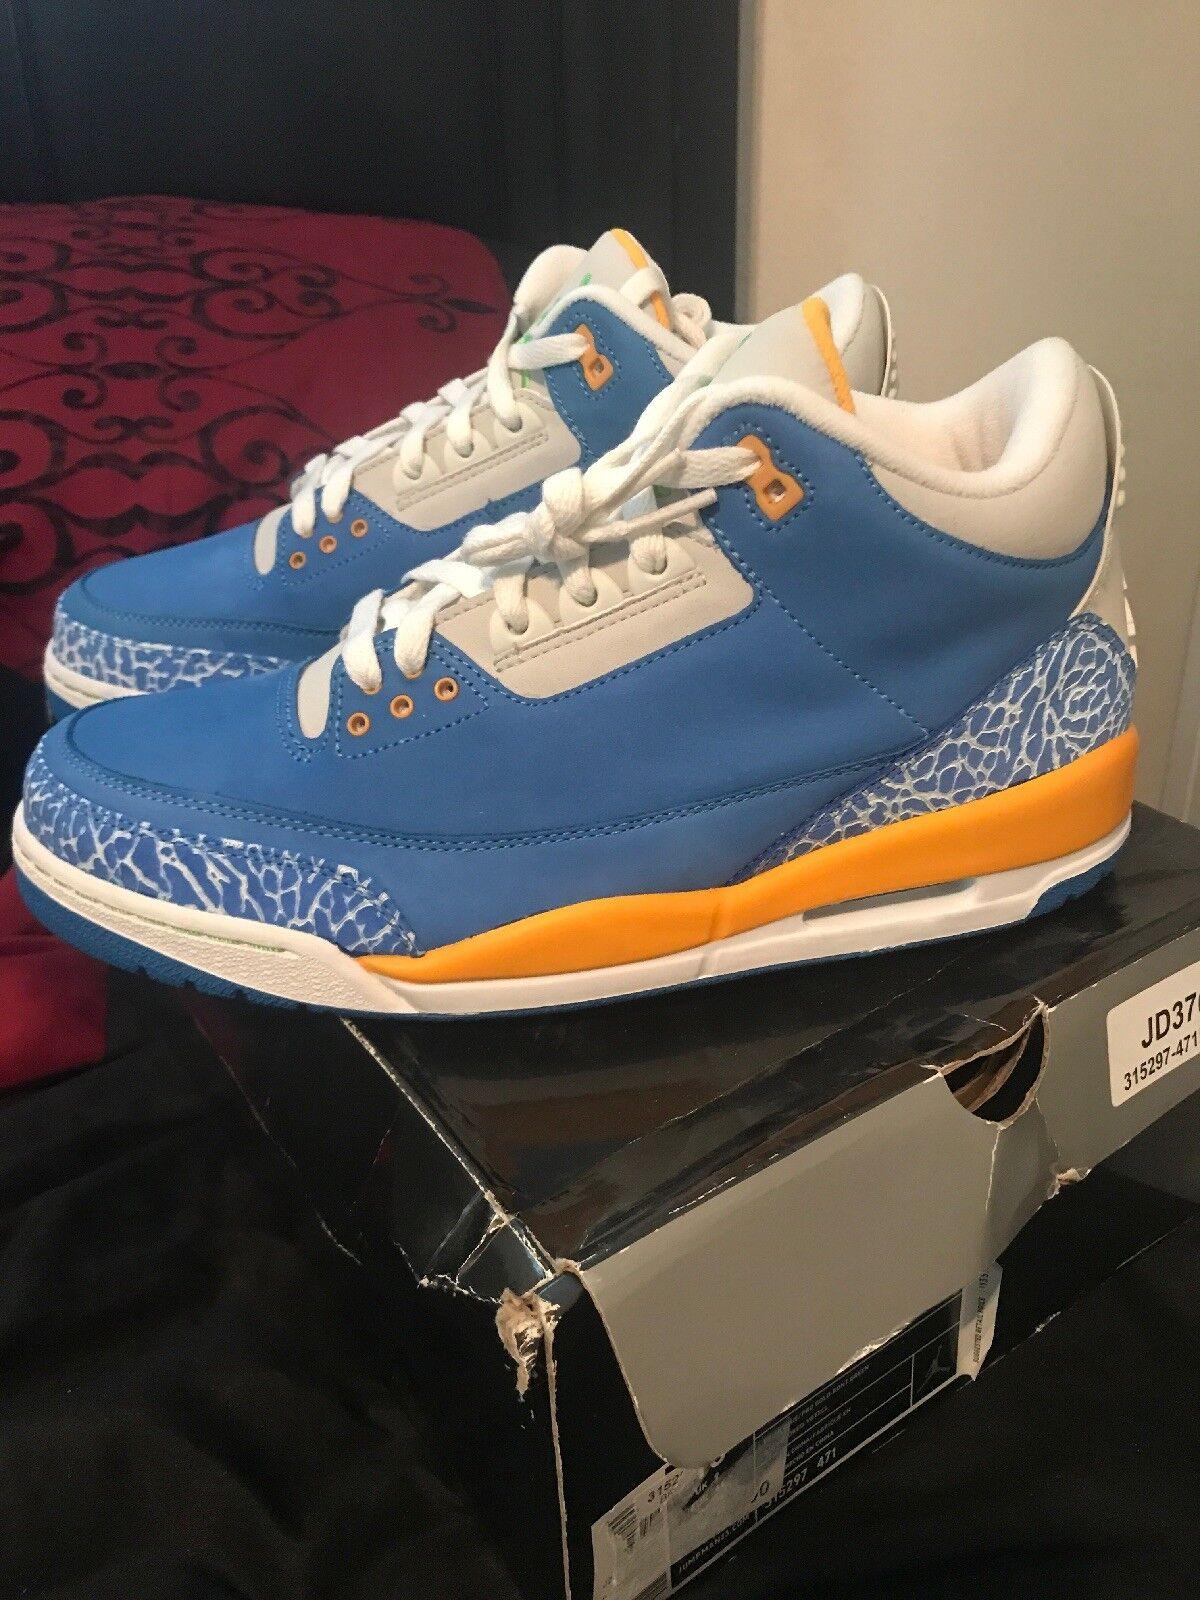 sports shoes 542f5 f04da ... sale nueva 2018 nike air jordan iii brisk 3 retro ls dtrt brisk iii  azul pro